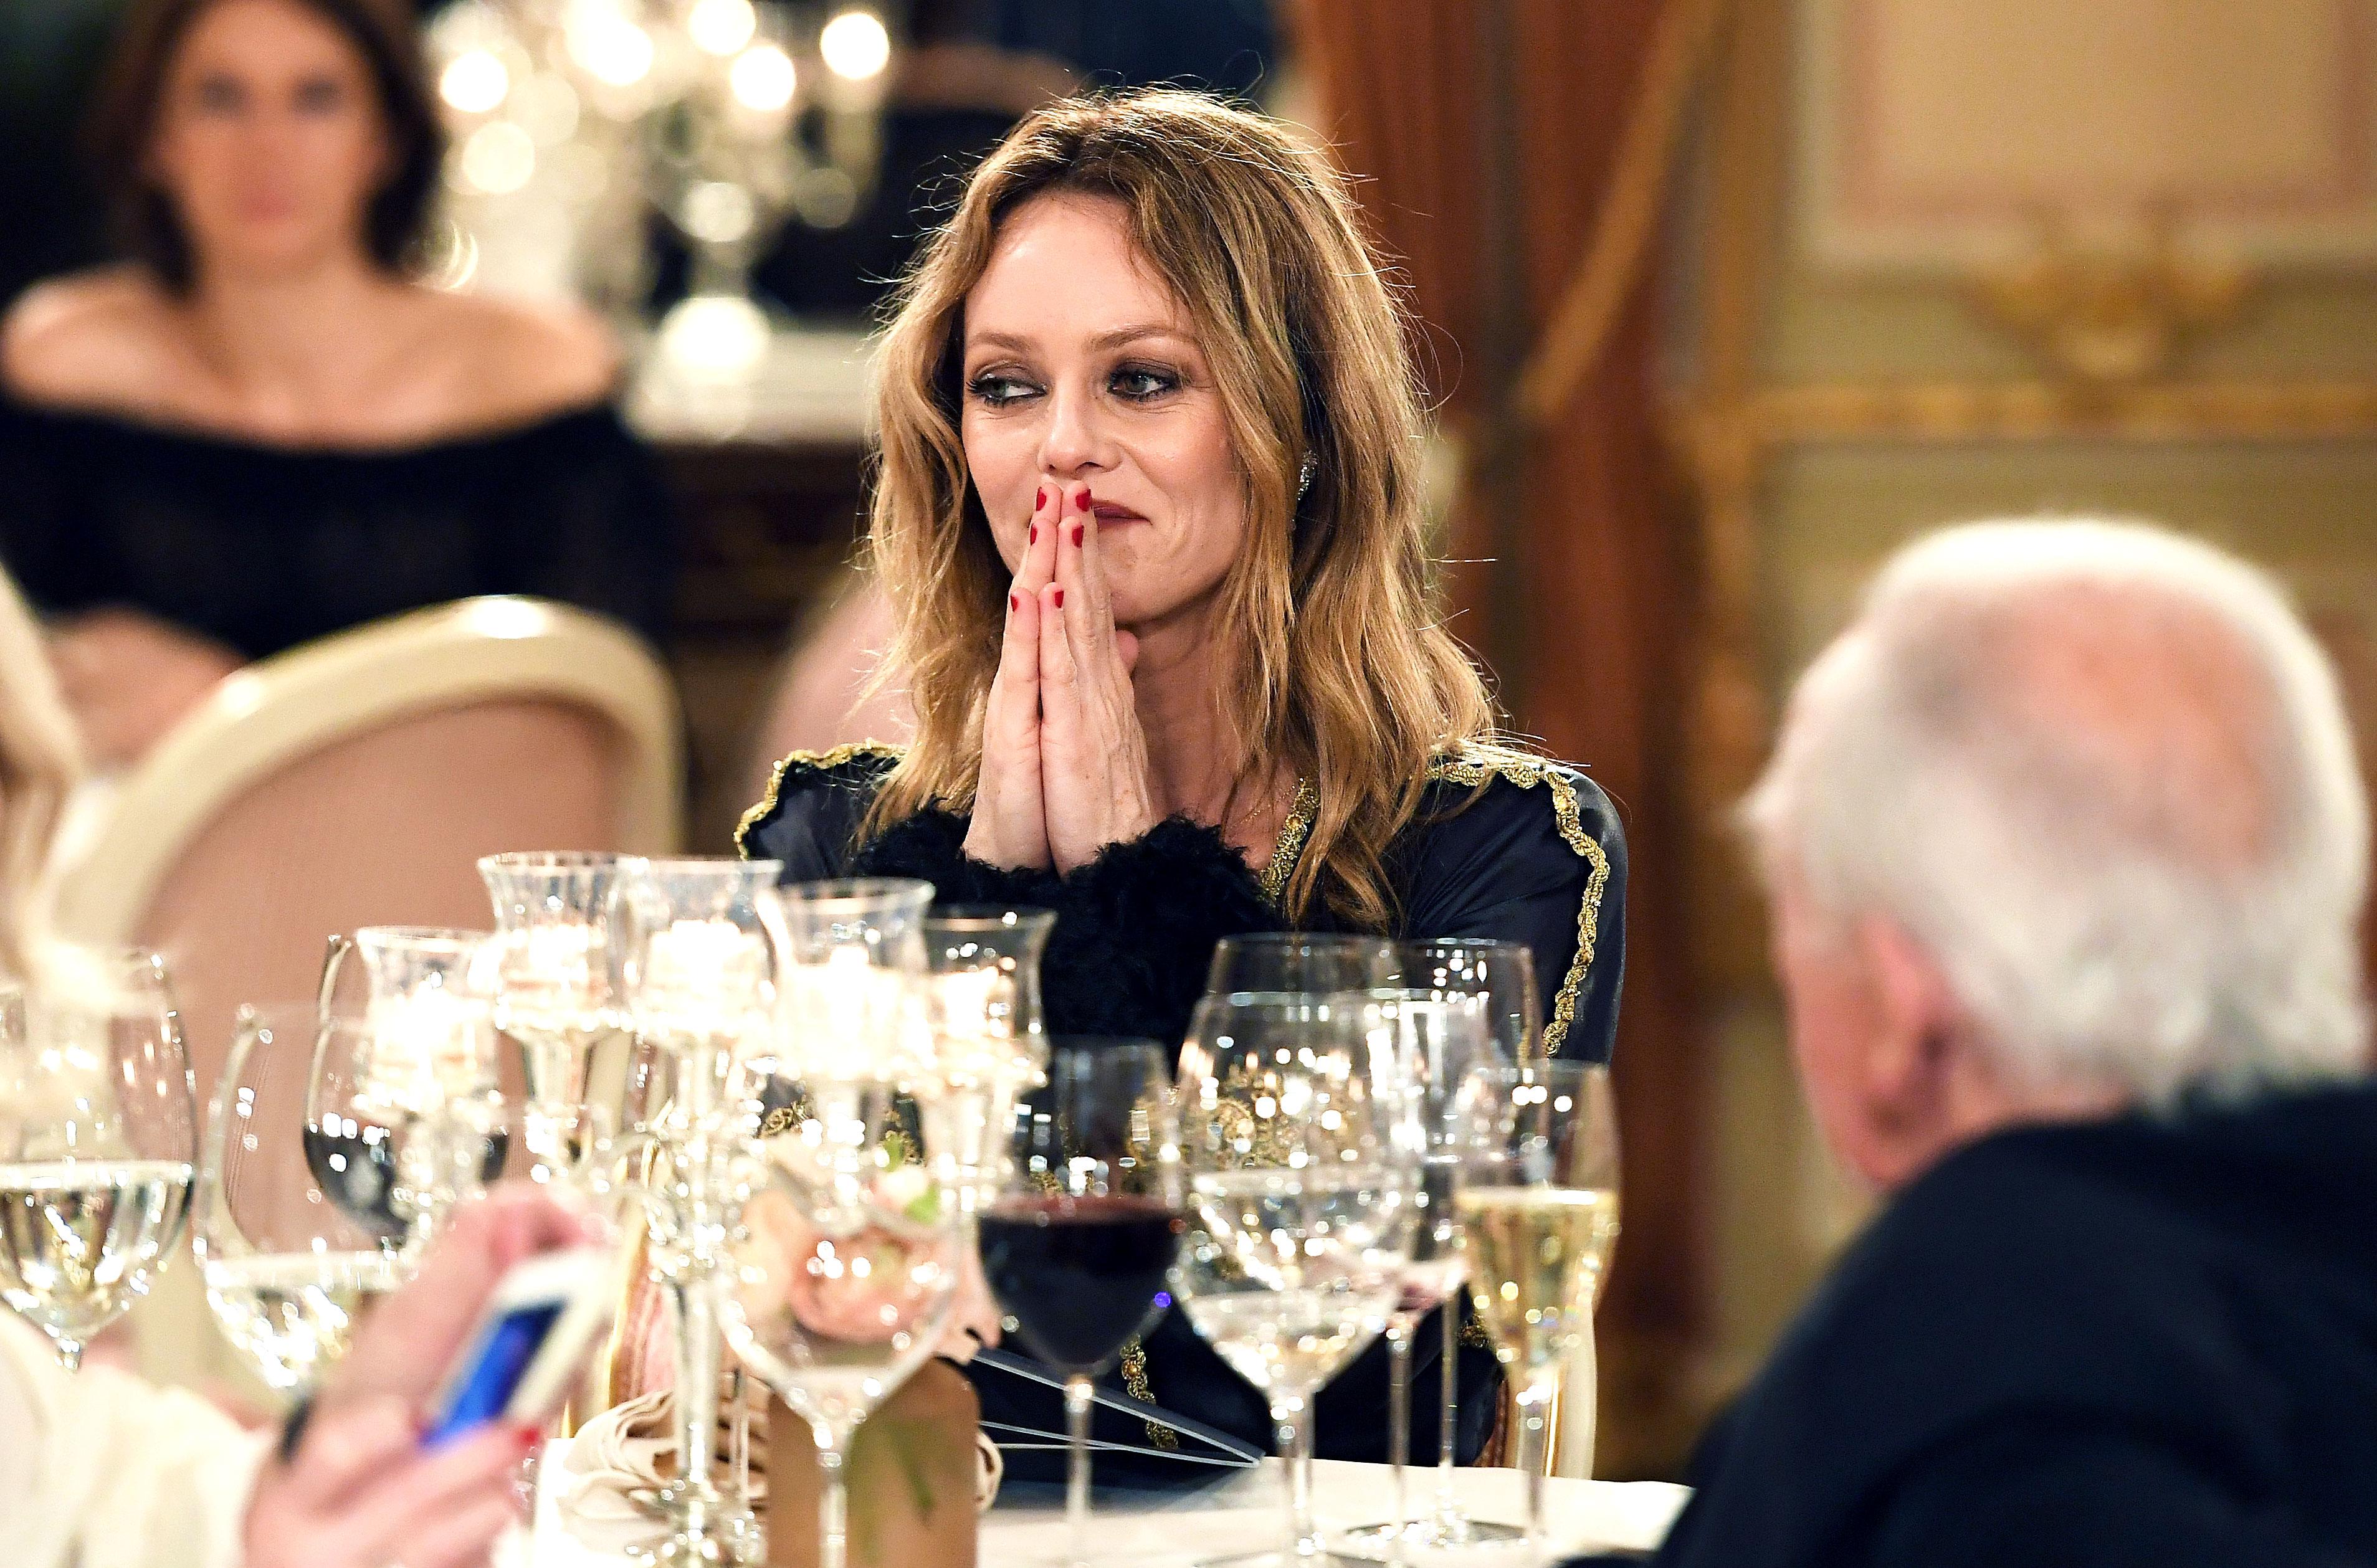 Lily-Rose Depp Makes Runway Modeling Debut at Chanel